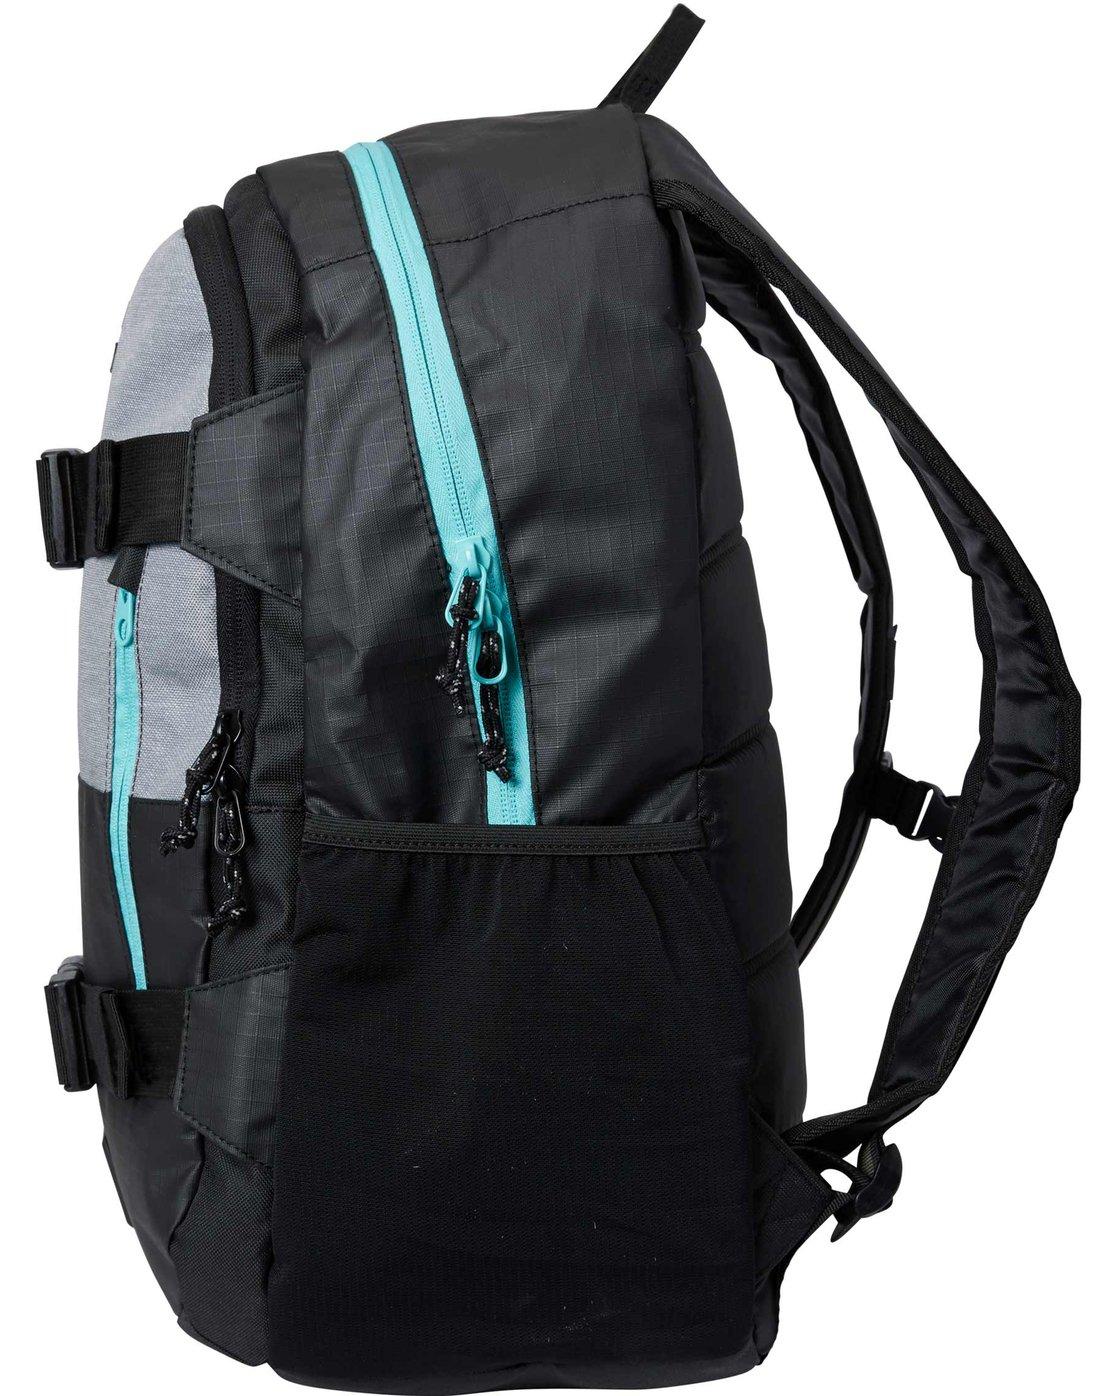 ee04597ad3 Command Skate Backpack MABKLCSK | Billabong